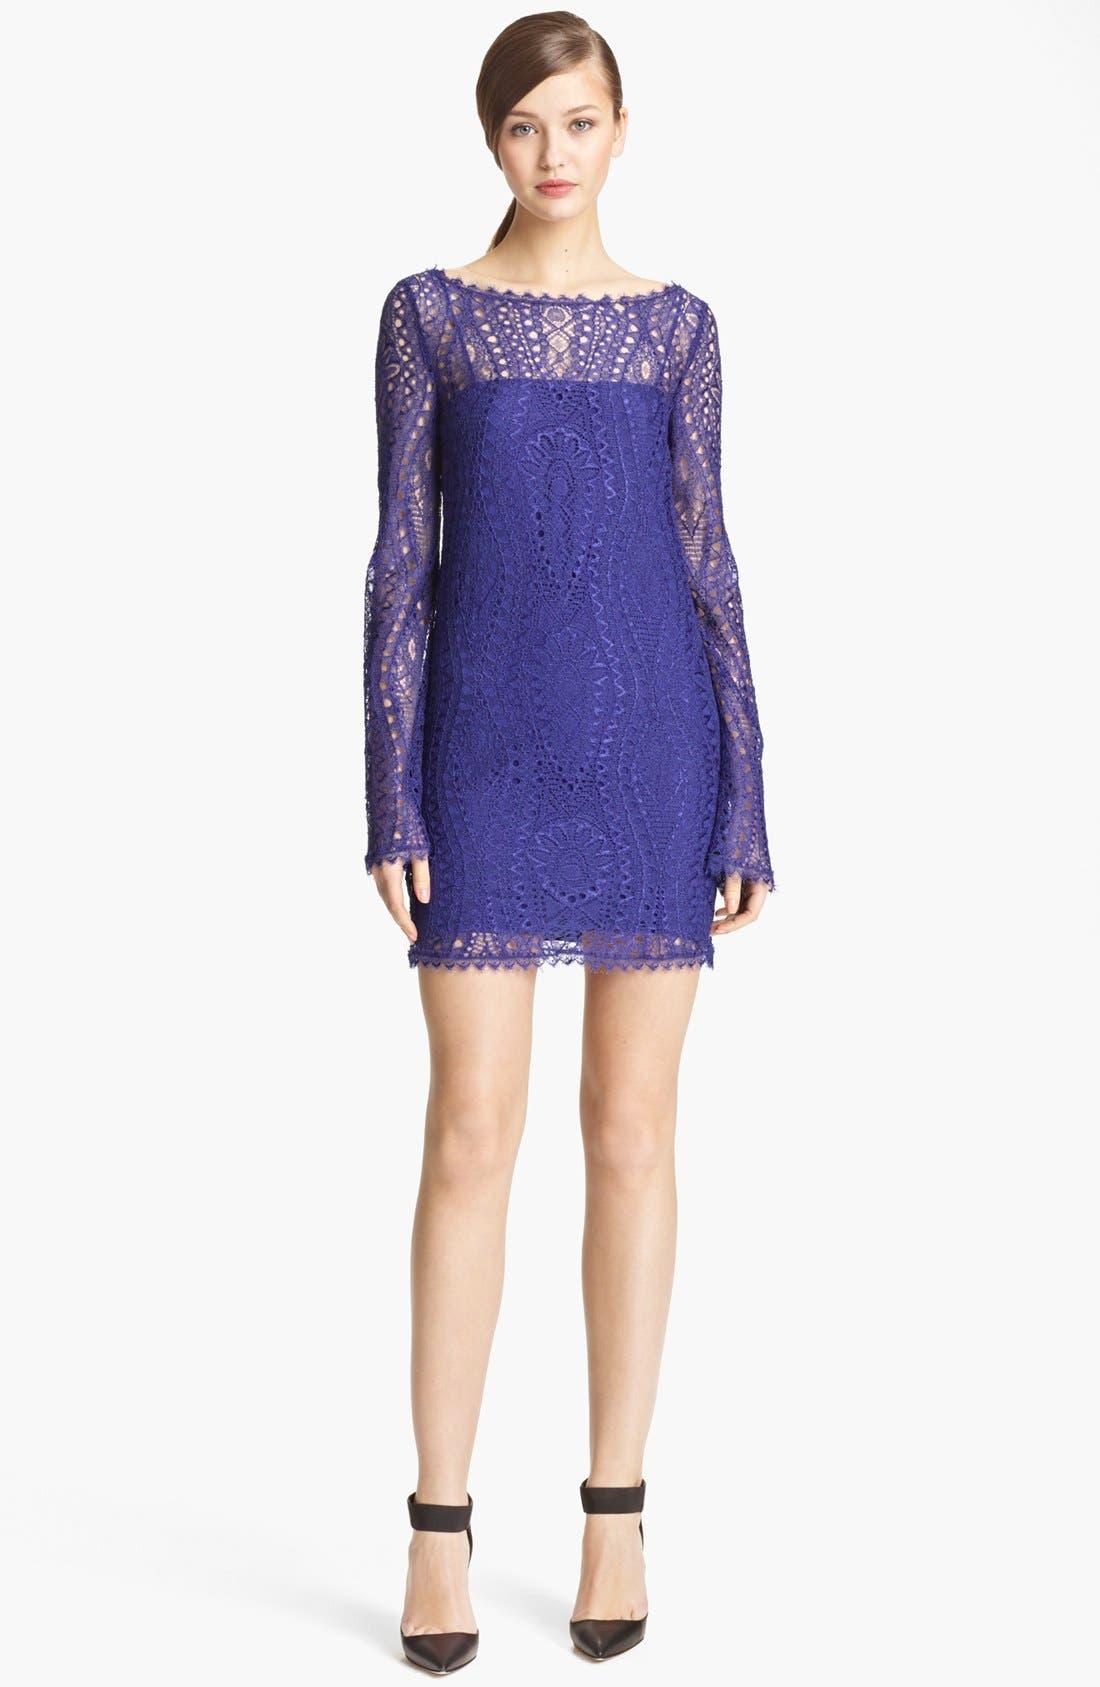 Alternate Image 1 Selected - Emilio Pucci Guipure Lace Dress